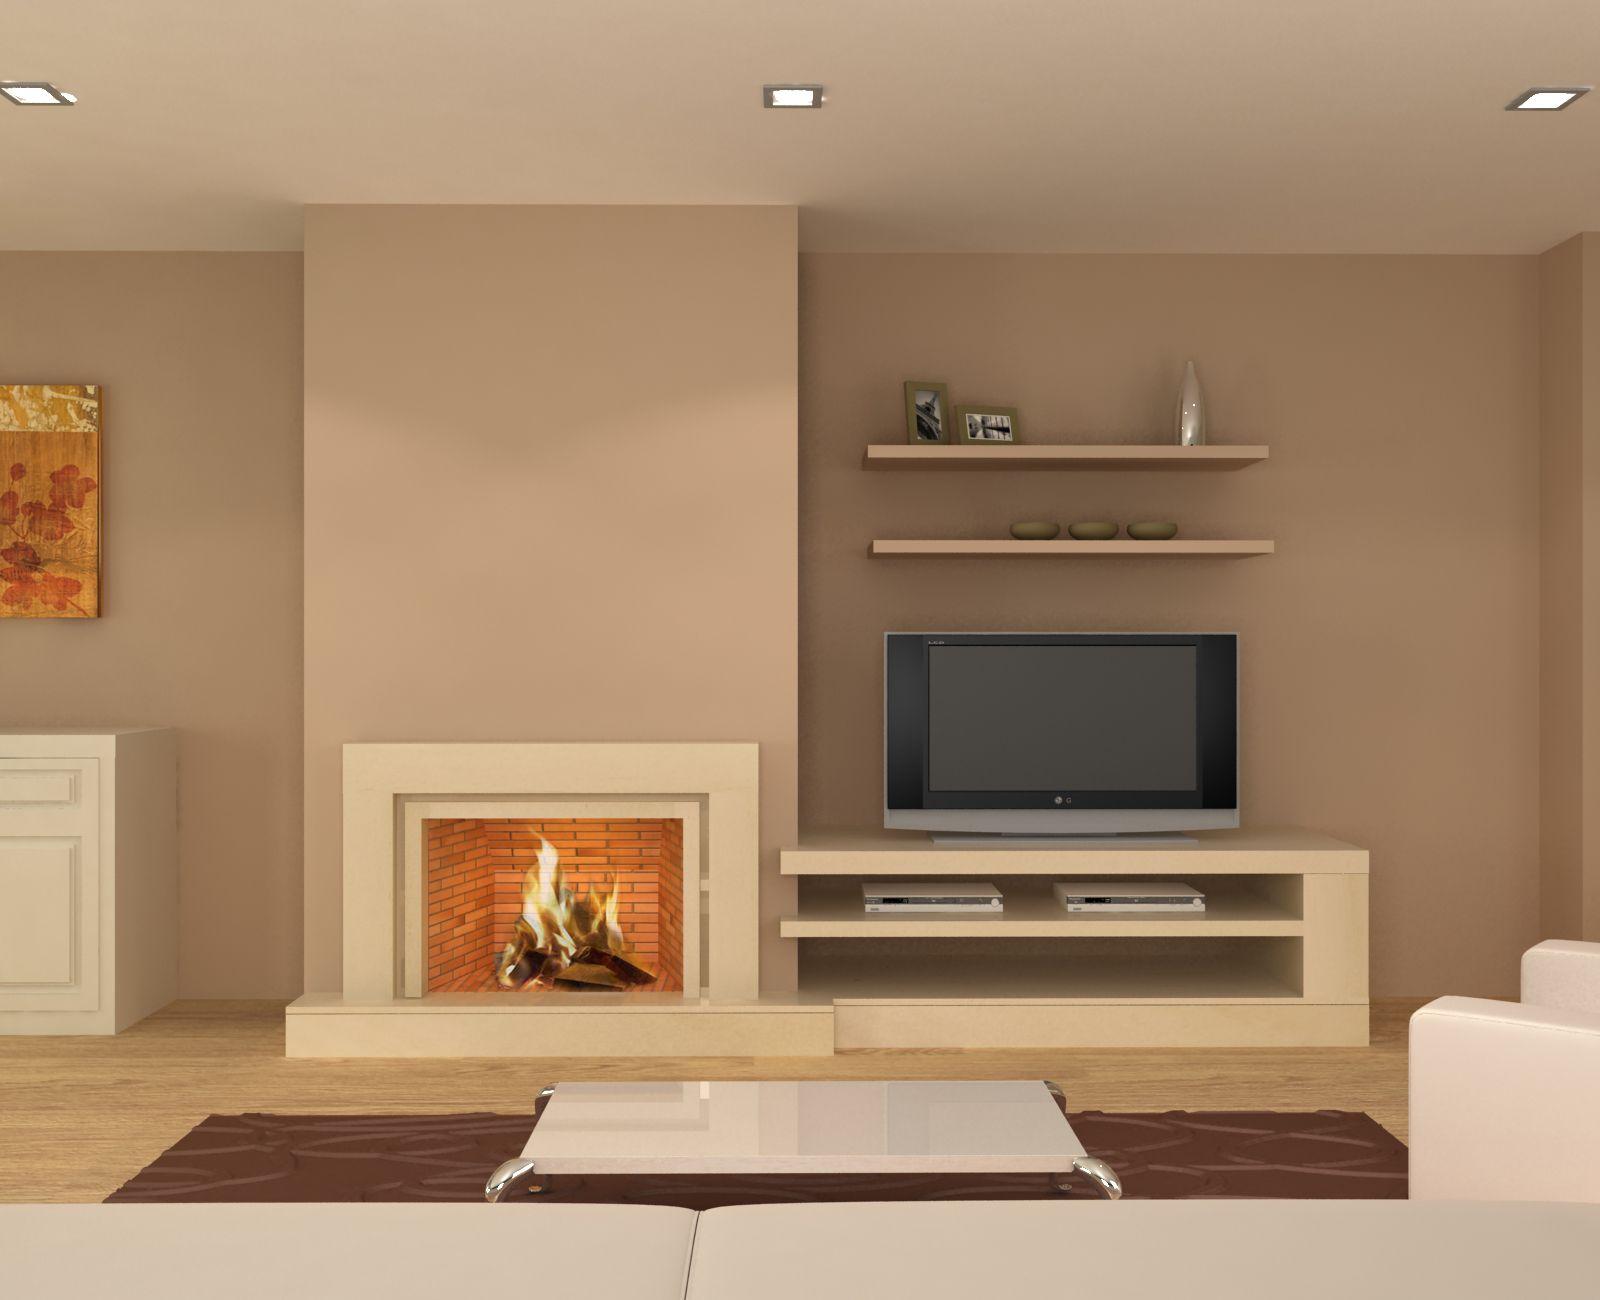 Resultado de imagen de decoracion chimeneas modernas | Chimeneas ...